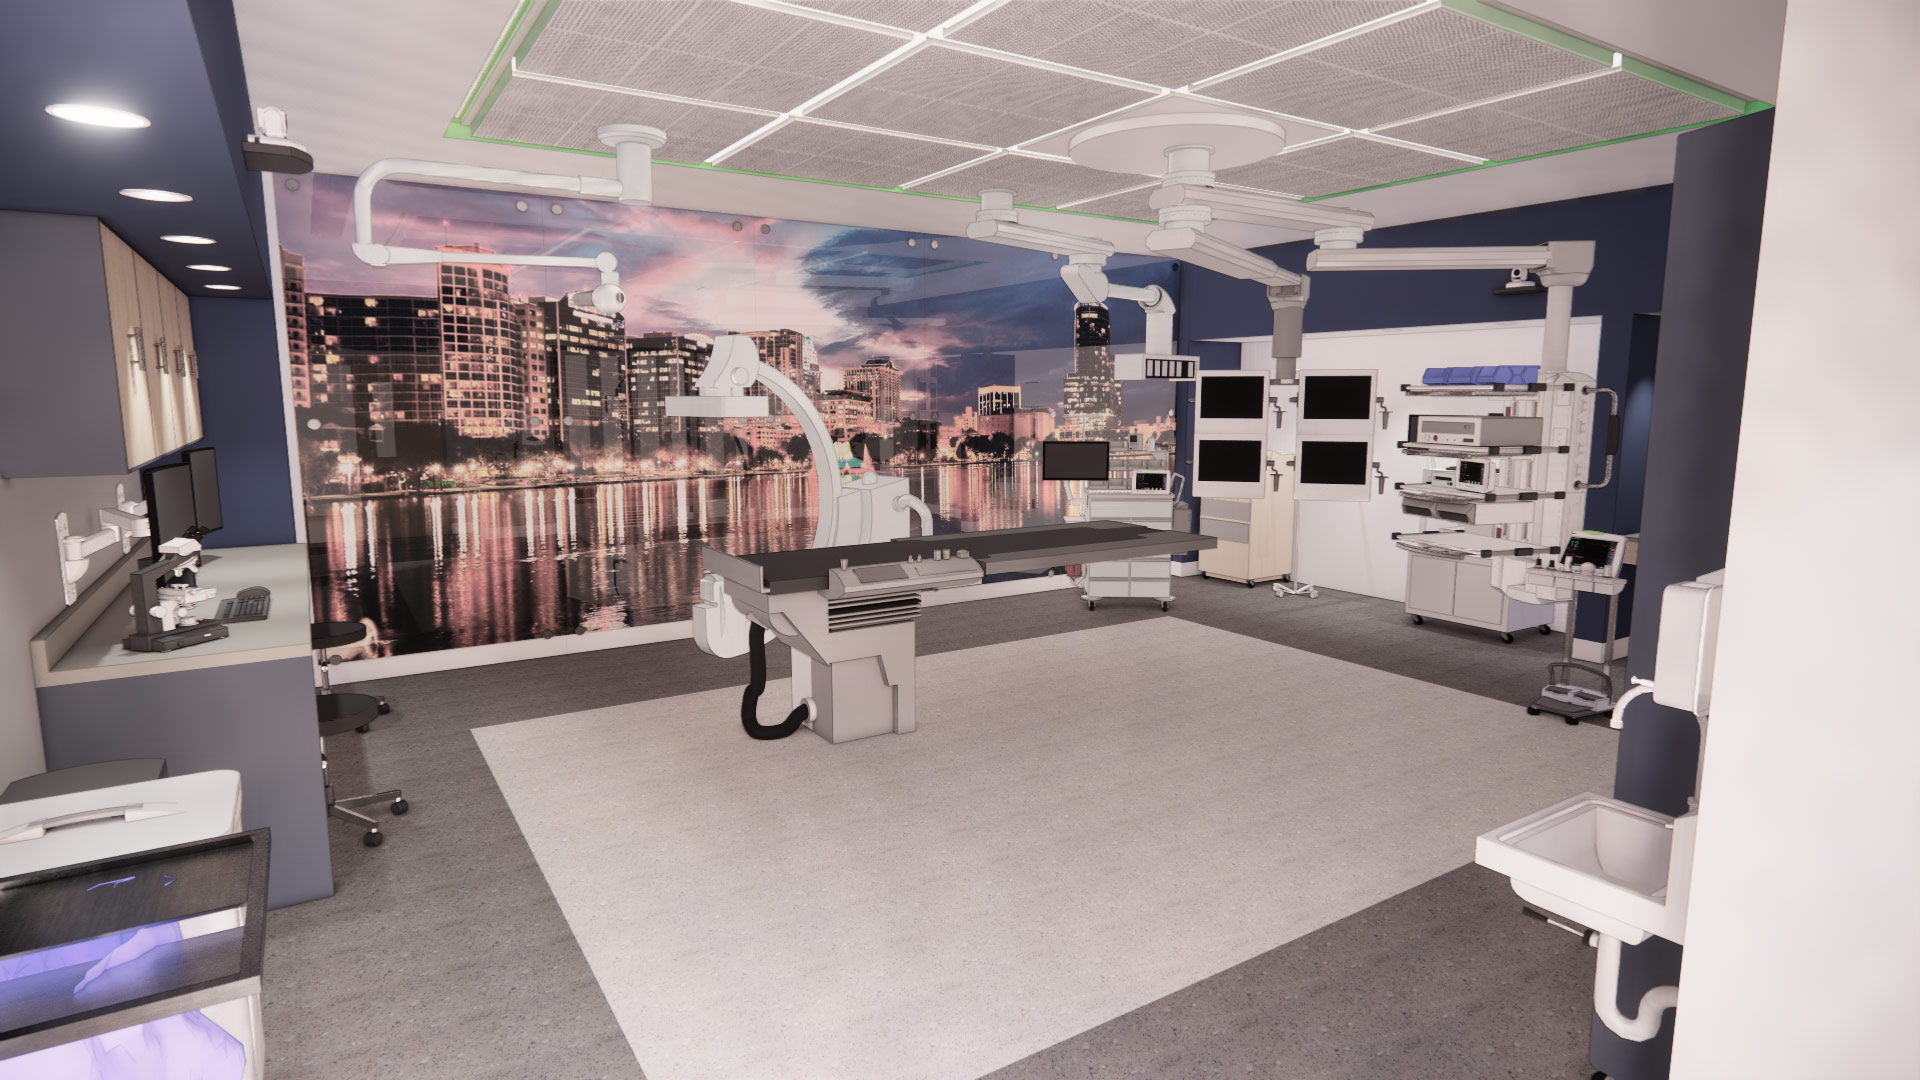 Orlando Health Digestive Health Institute Rendering